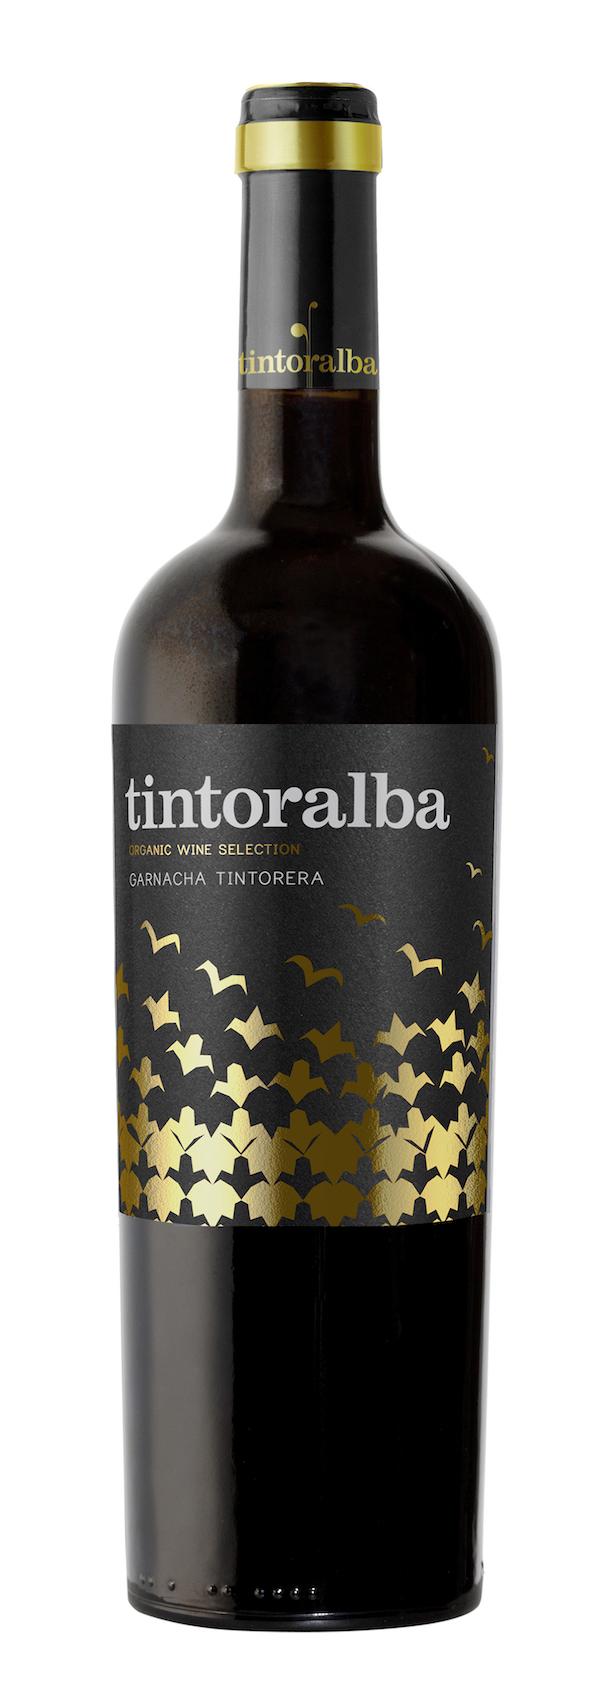 TINTORALBA ORGANIC SELECTION 2016 · Garnacha Tintorera